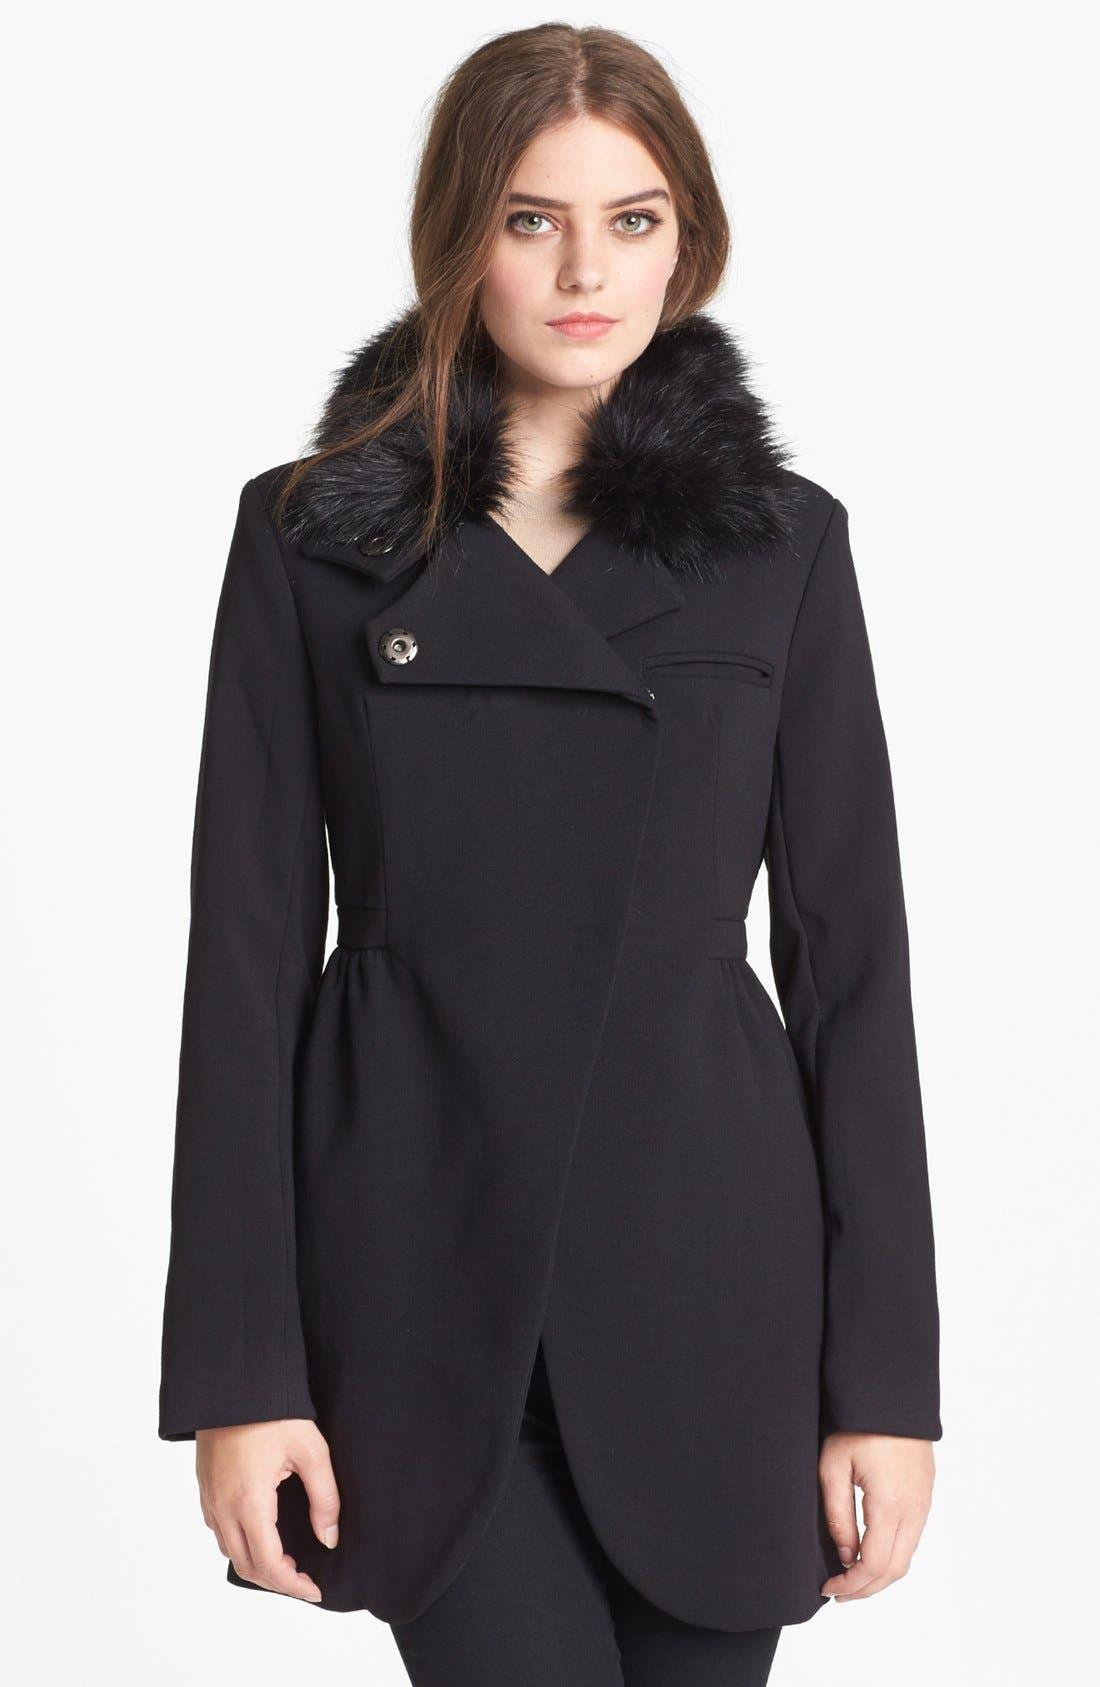 Main Image - bebe Asymmetrical Coat with Detachable Faux Fur Collar